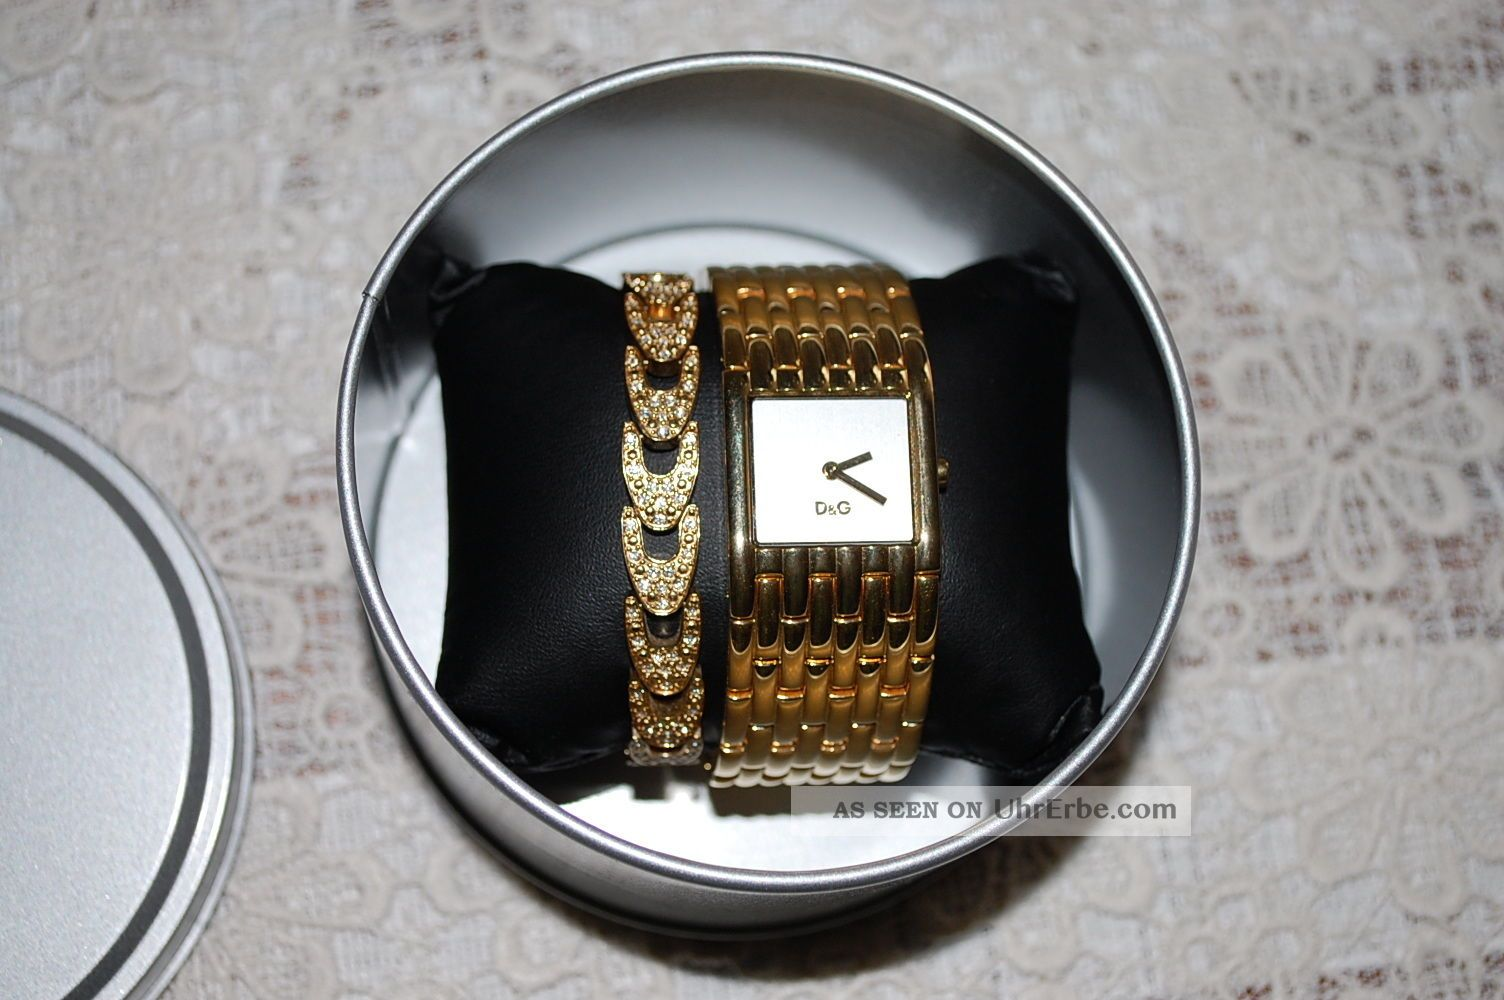 D&g Dolce Cabbana Damenuhr Time Mit Strass Goldfarbe Armbanduhren Bild